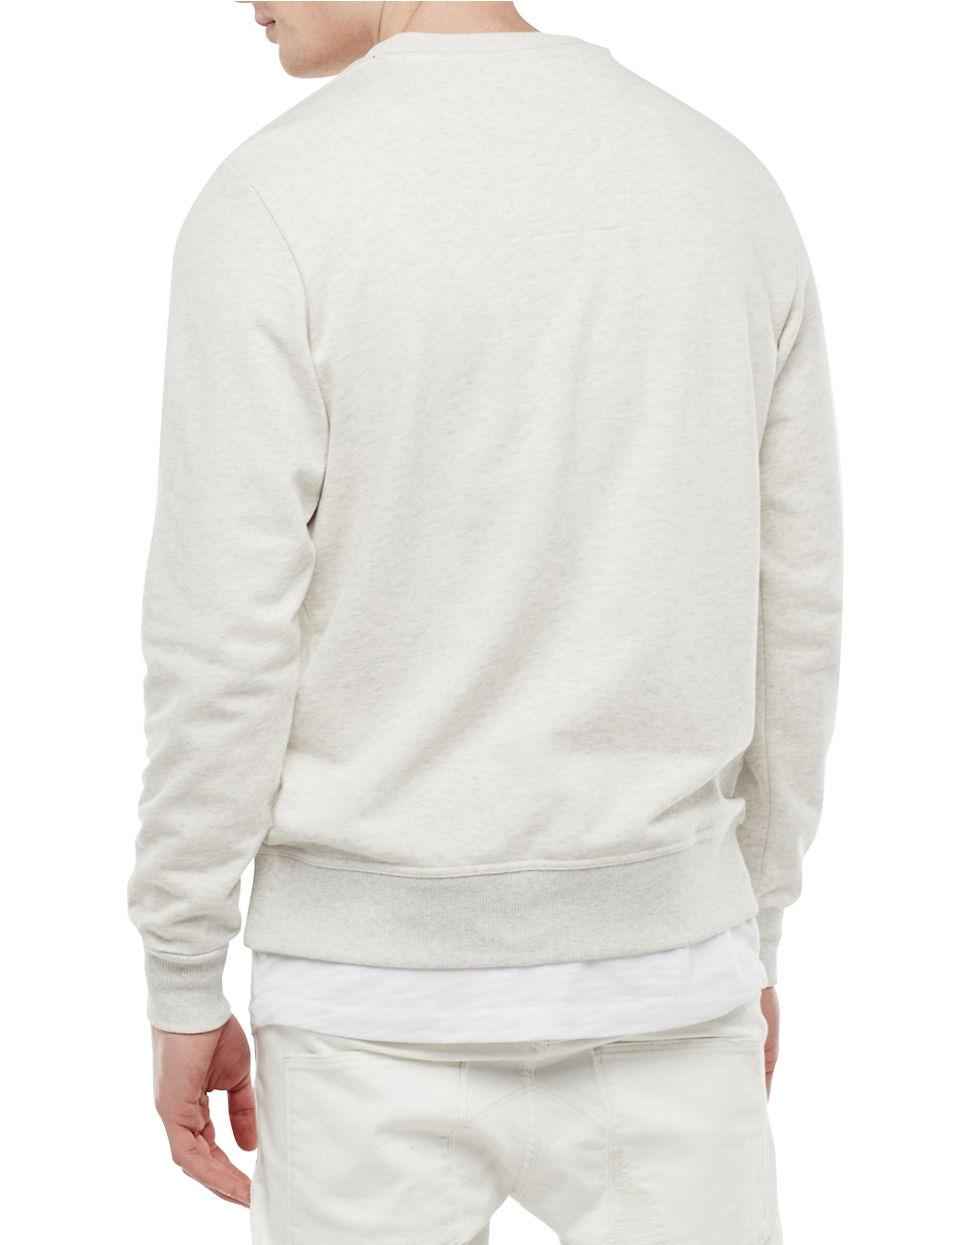 g star raw logo pullover sweatshirt in white for men lyst. Black Bedroom Furniture Sets. Home Design Ideas